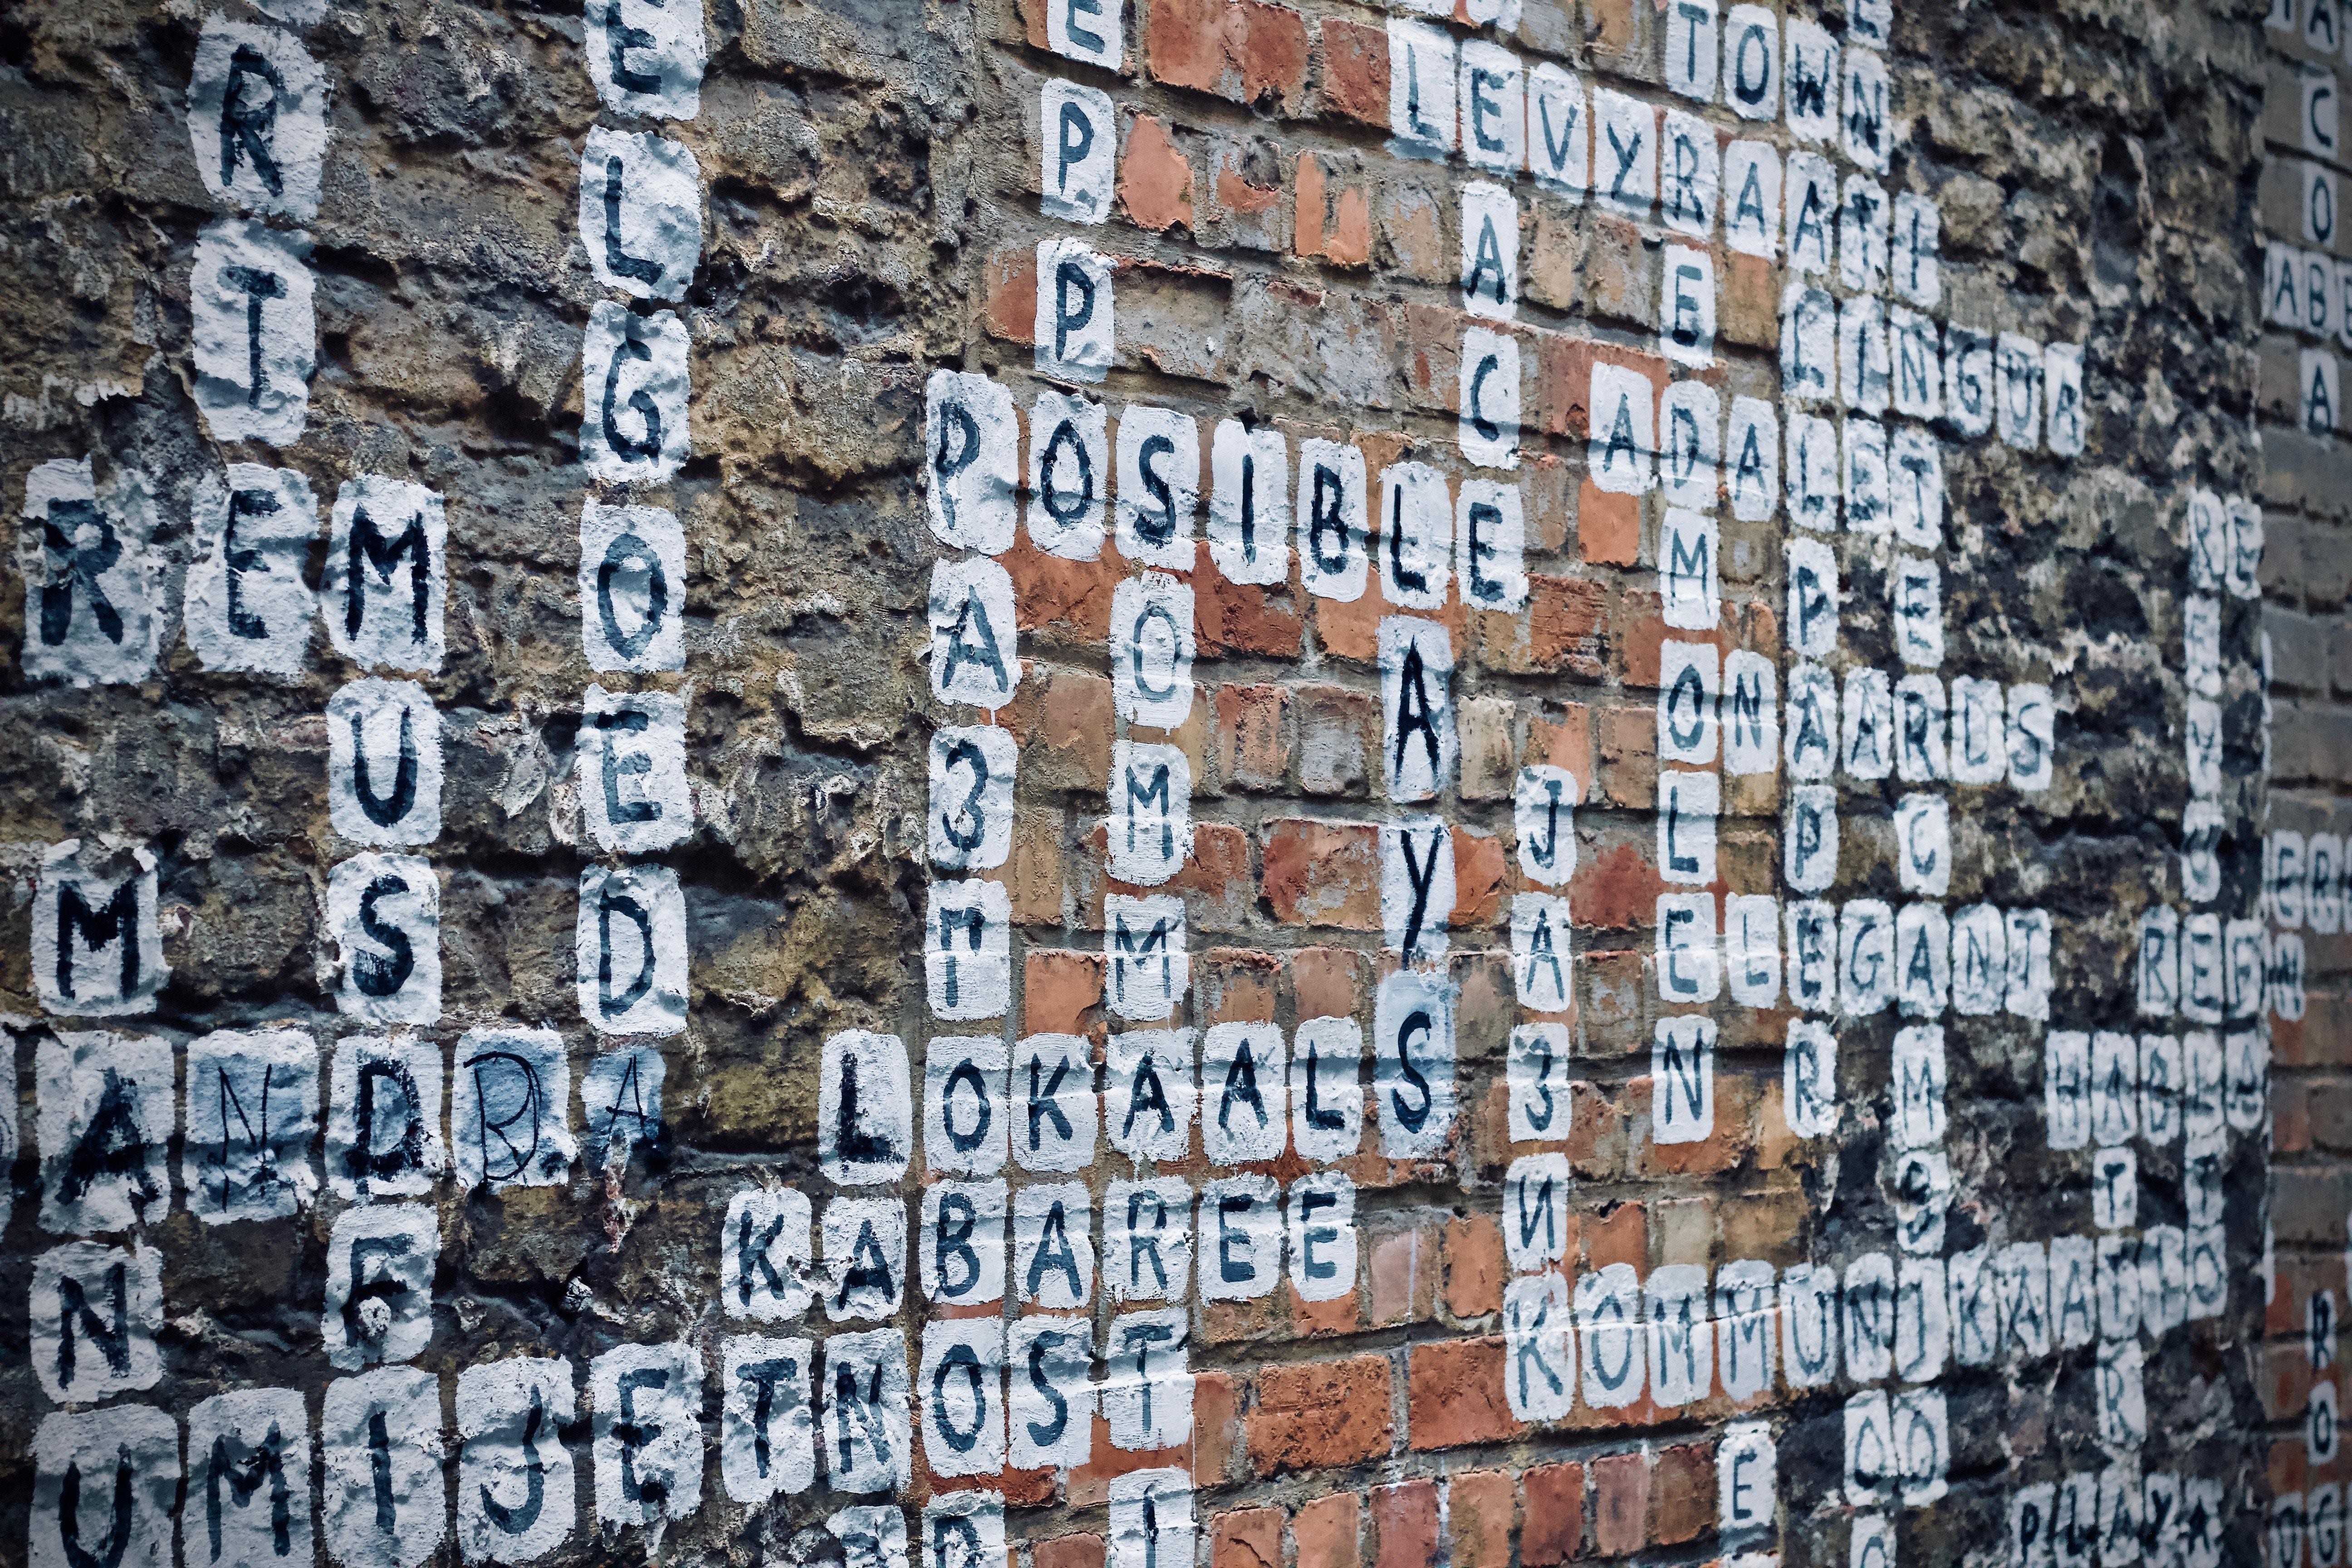 scrabble art on a wall (Unslpash)